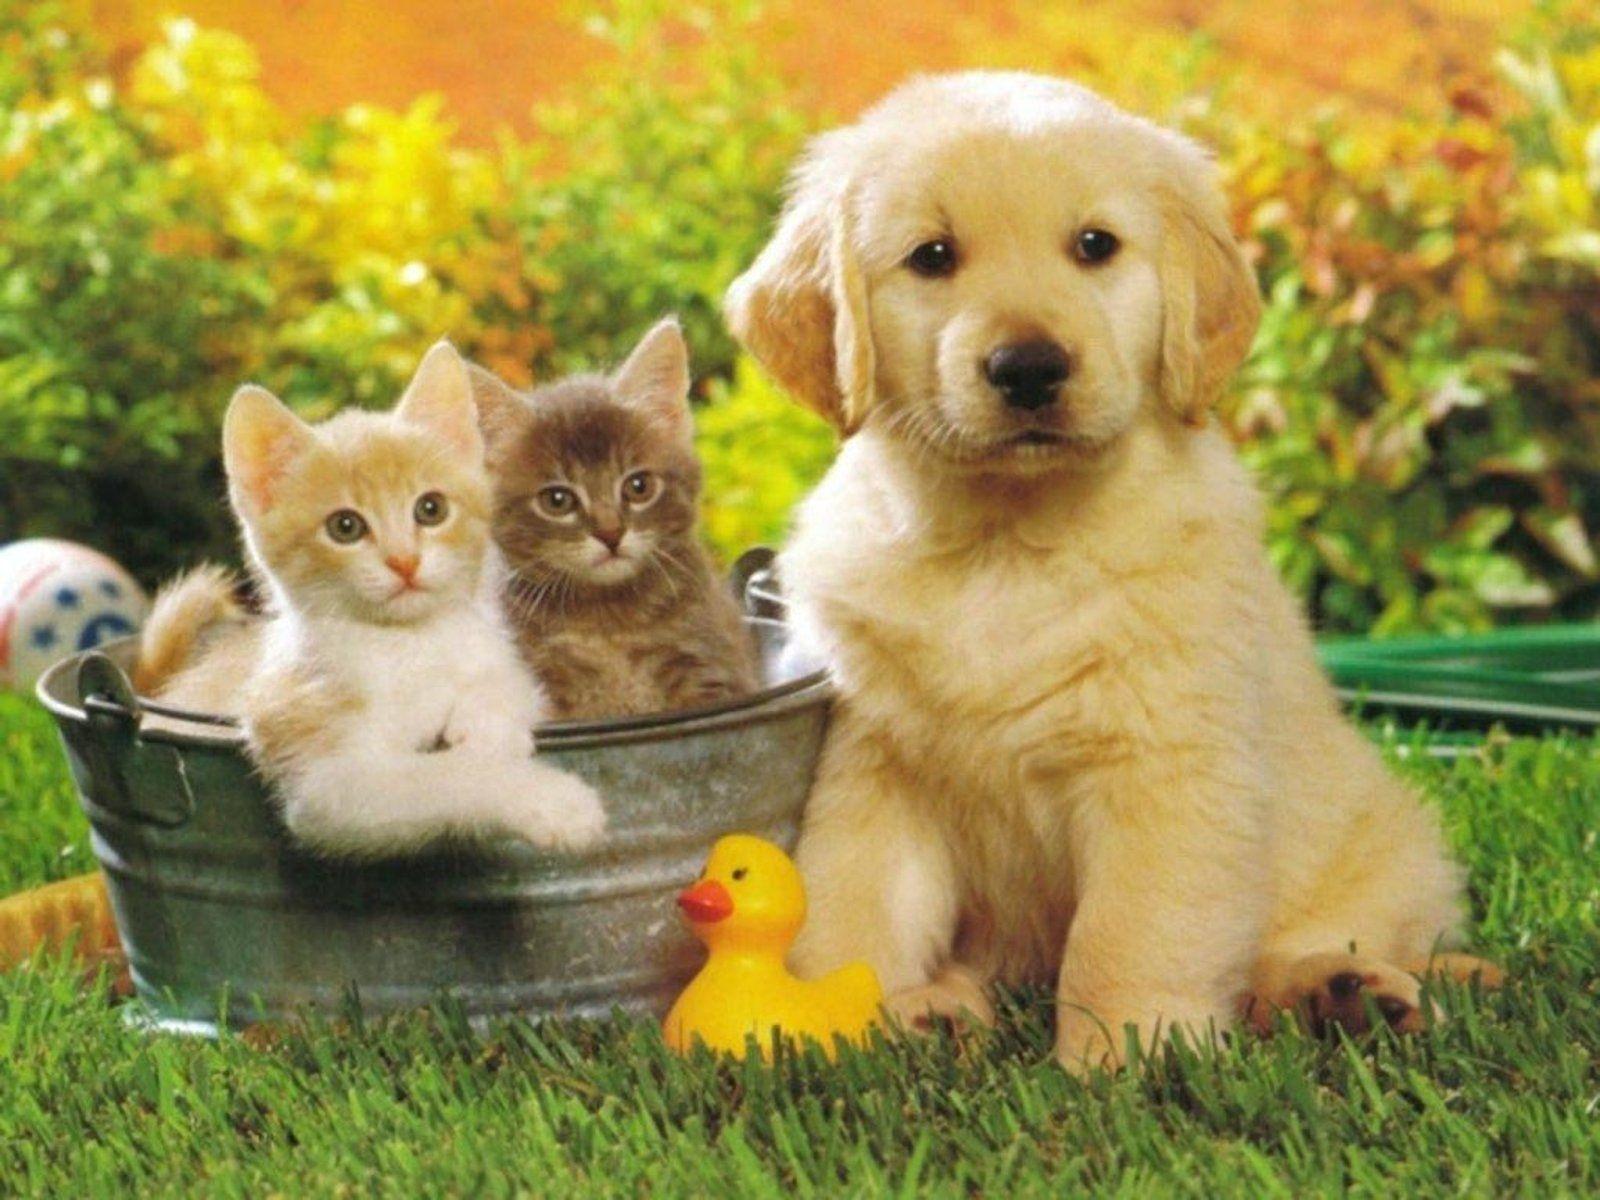 puppy + kittens = cute pets